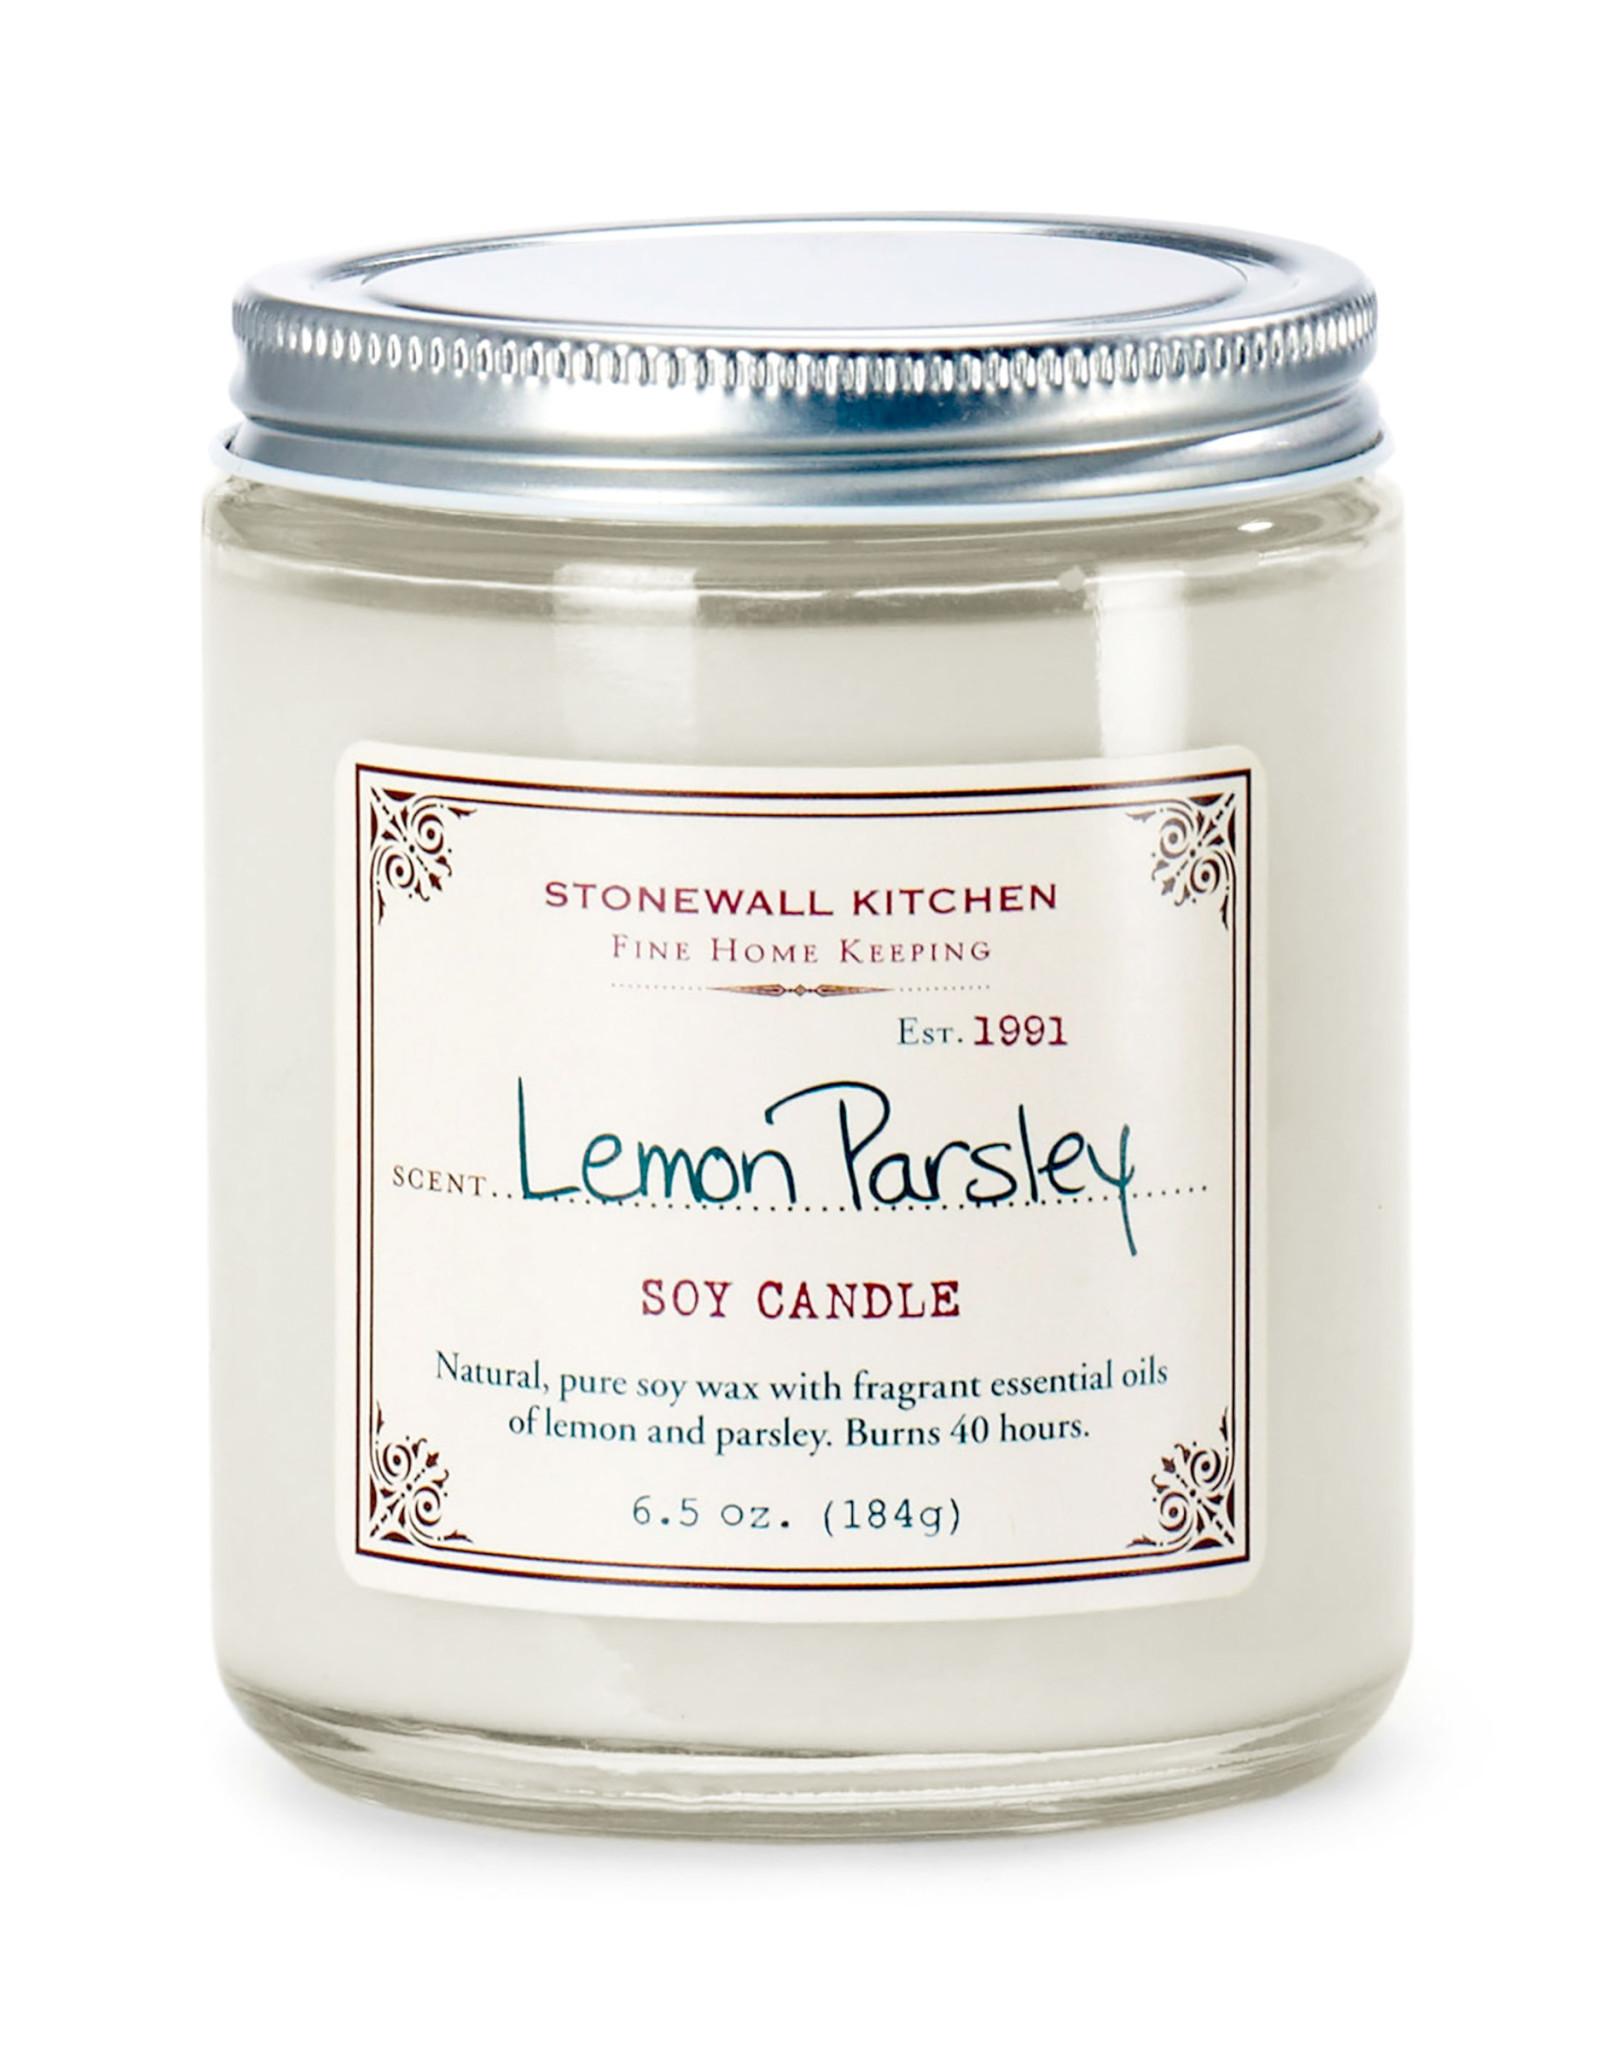 Stonewall Kitchen Lemon Parsley Candle